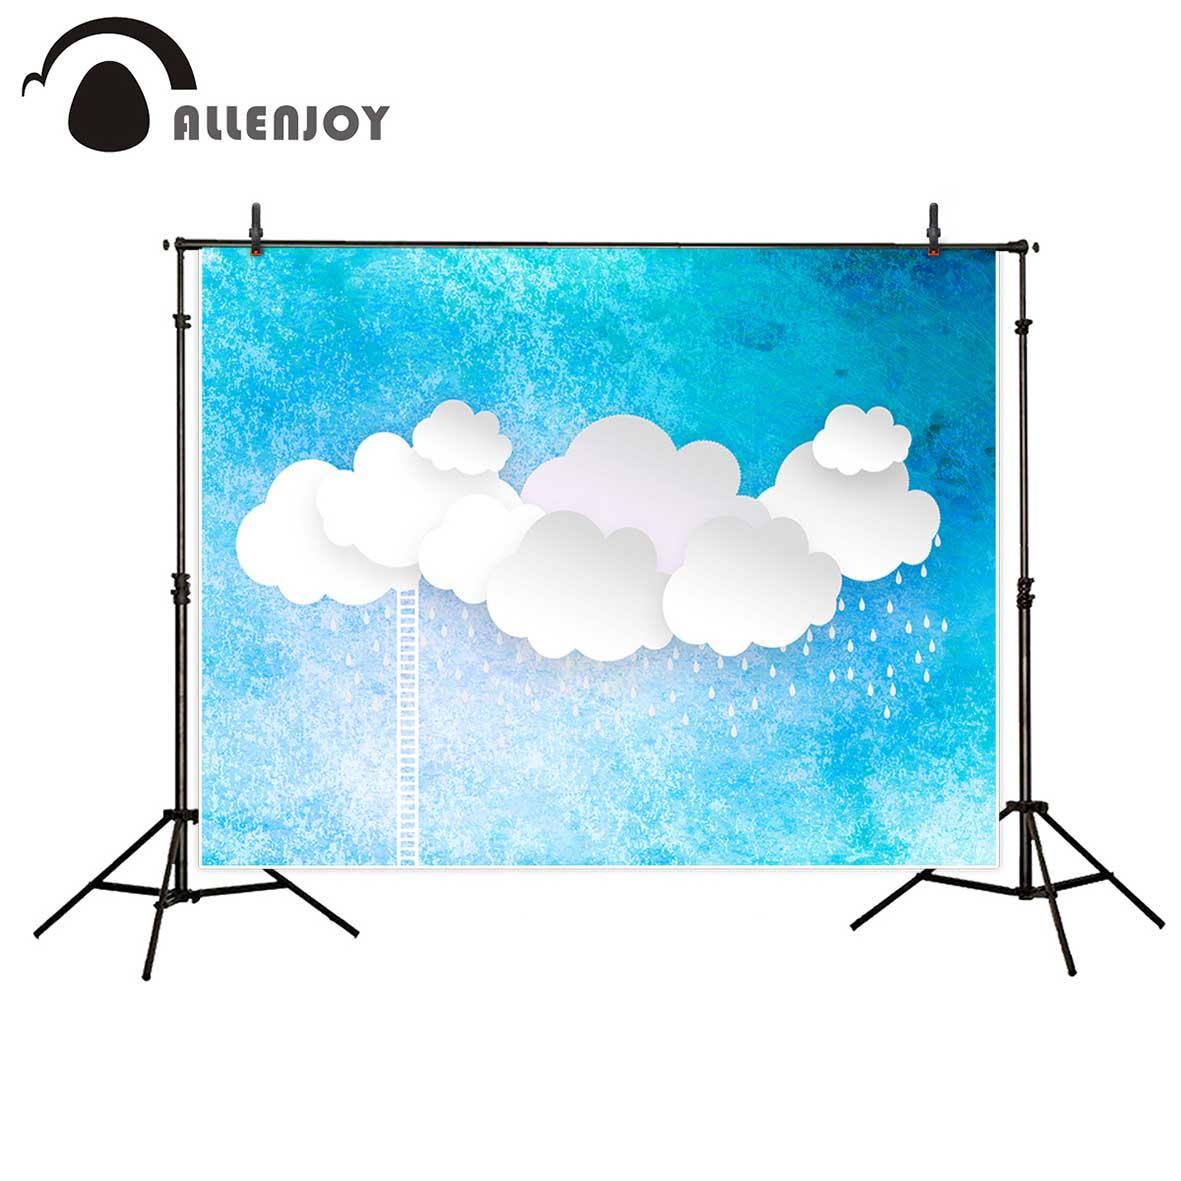 Allenjoy photography backdrop baby shower blue sky paper cloud ladder professional background photo printer for kids blue sky чаша северный олень